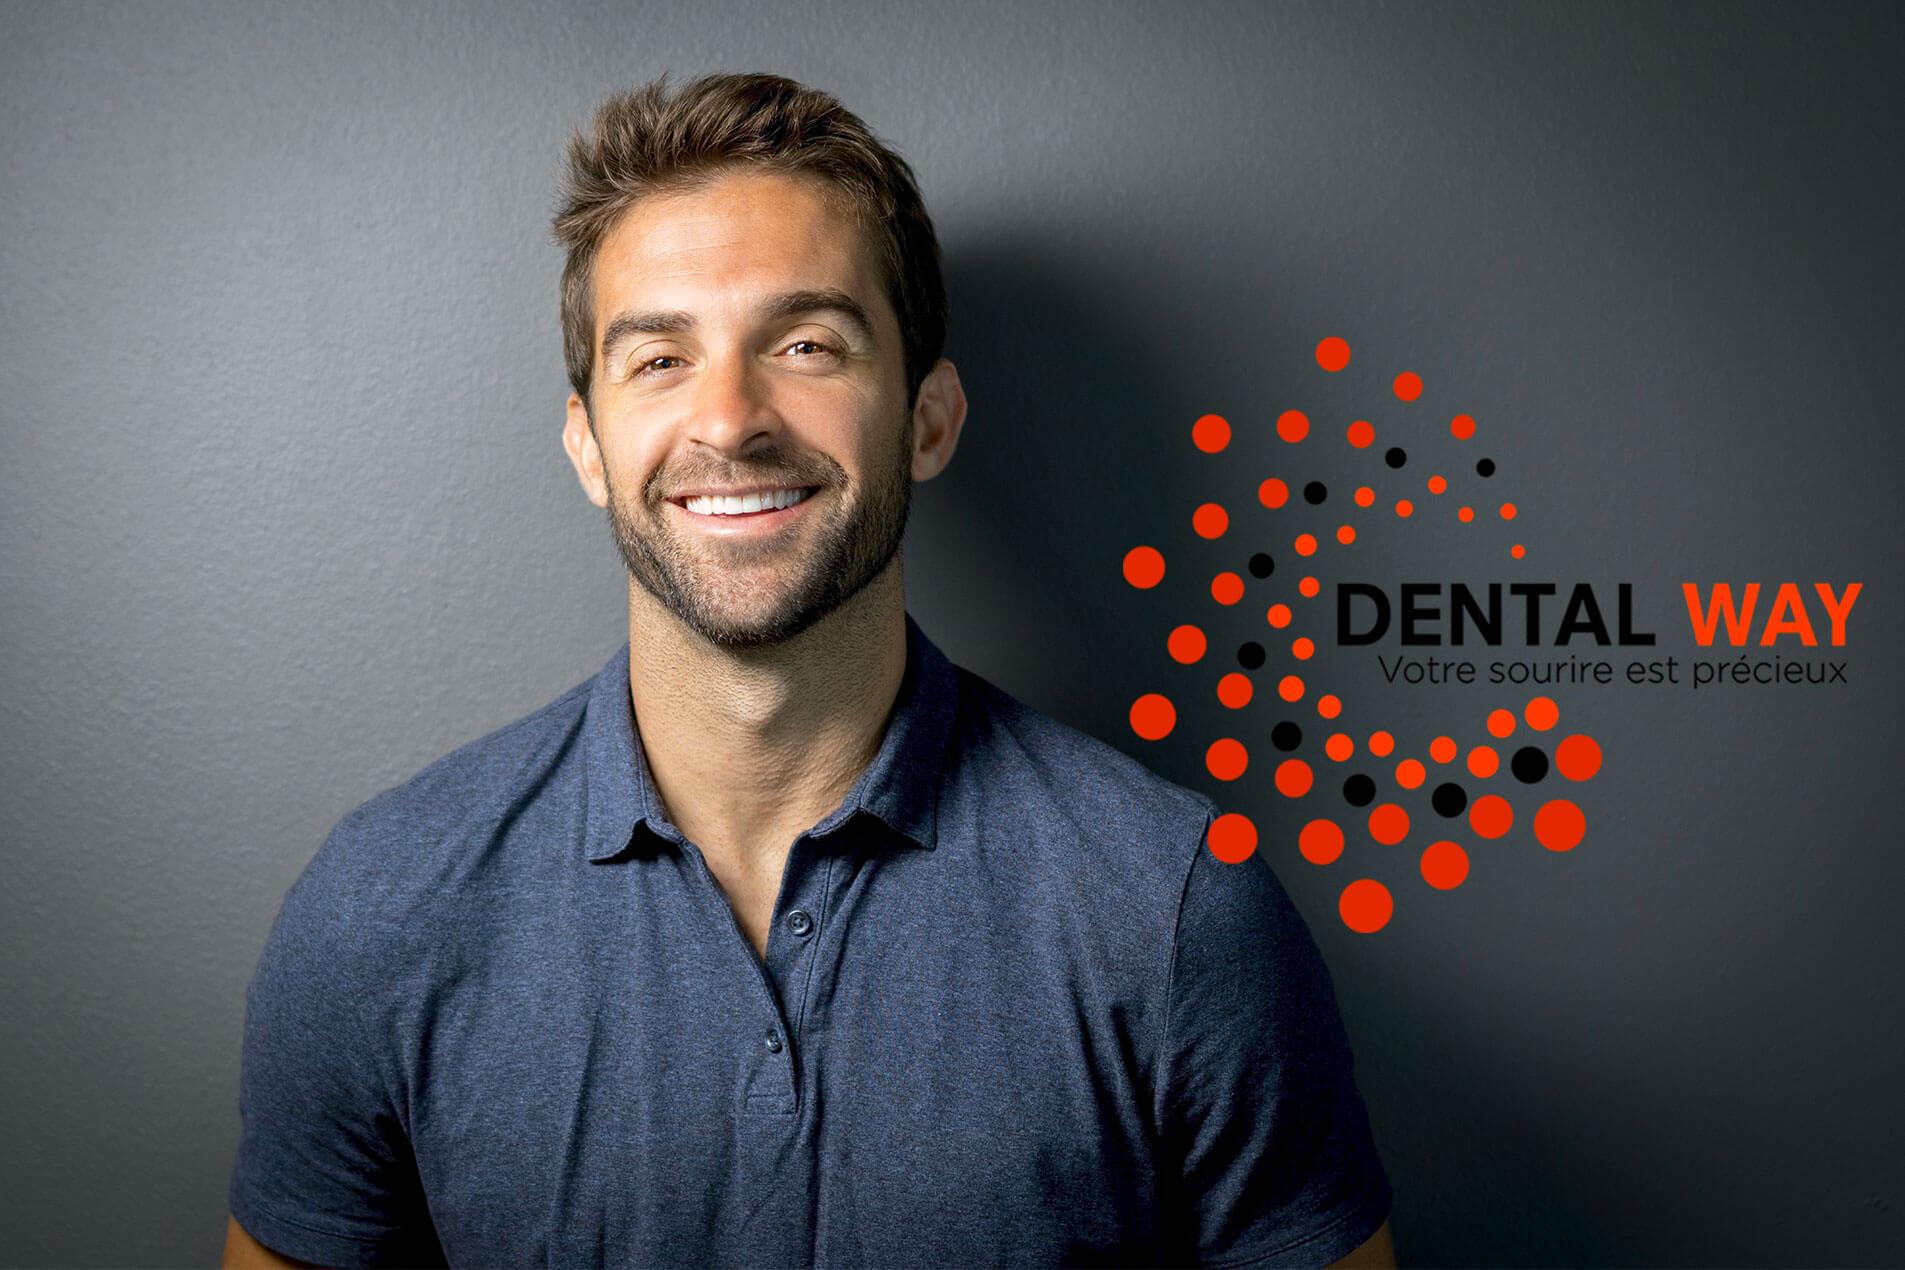 eclaircissement dentaire-dentiste beaujolais